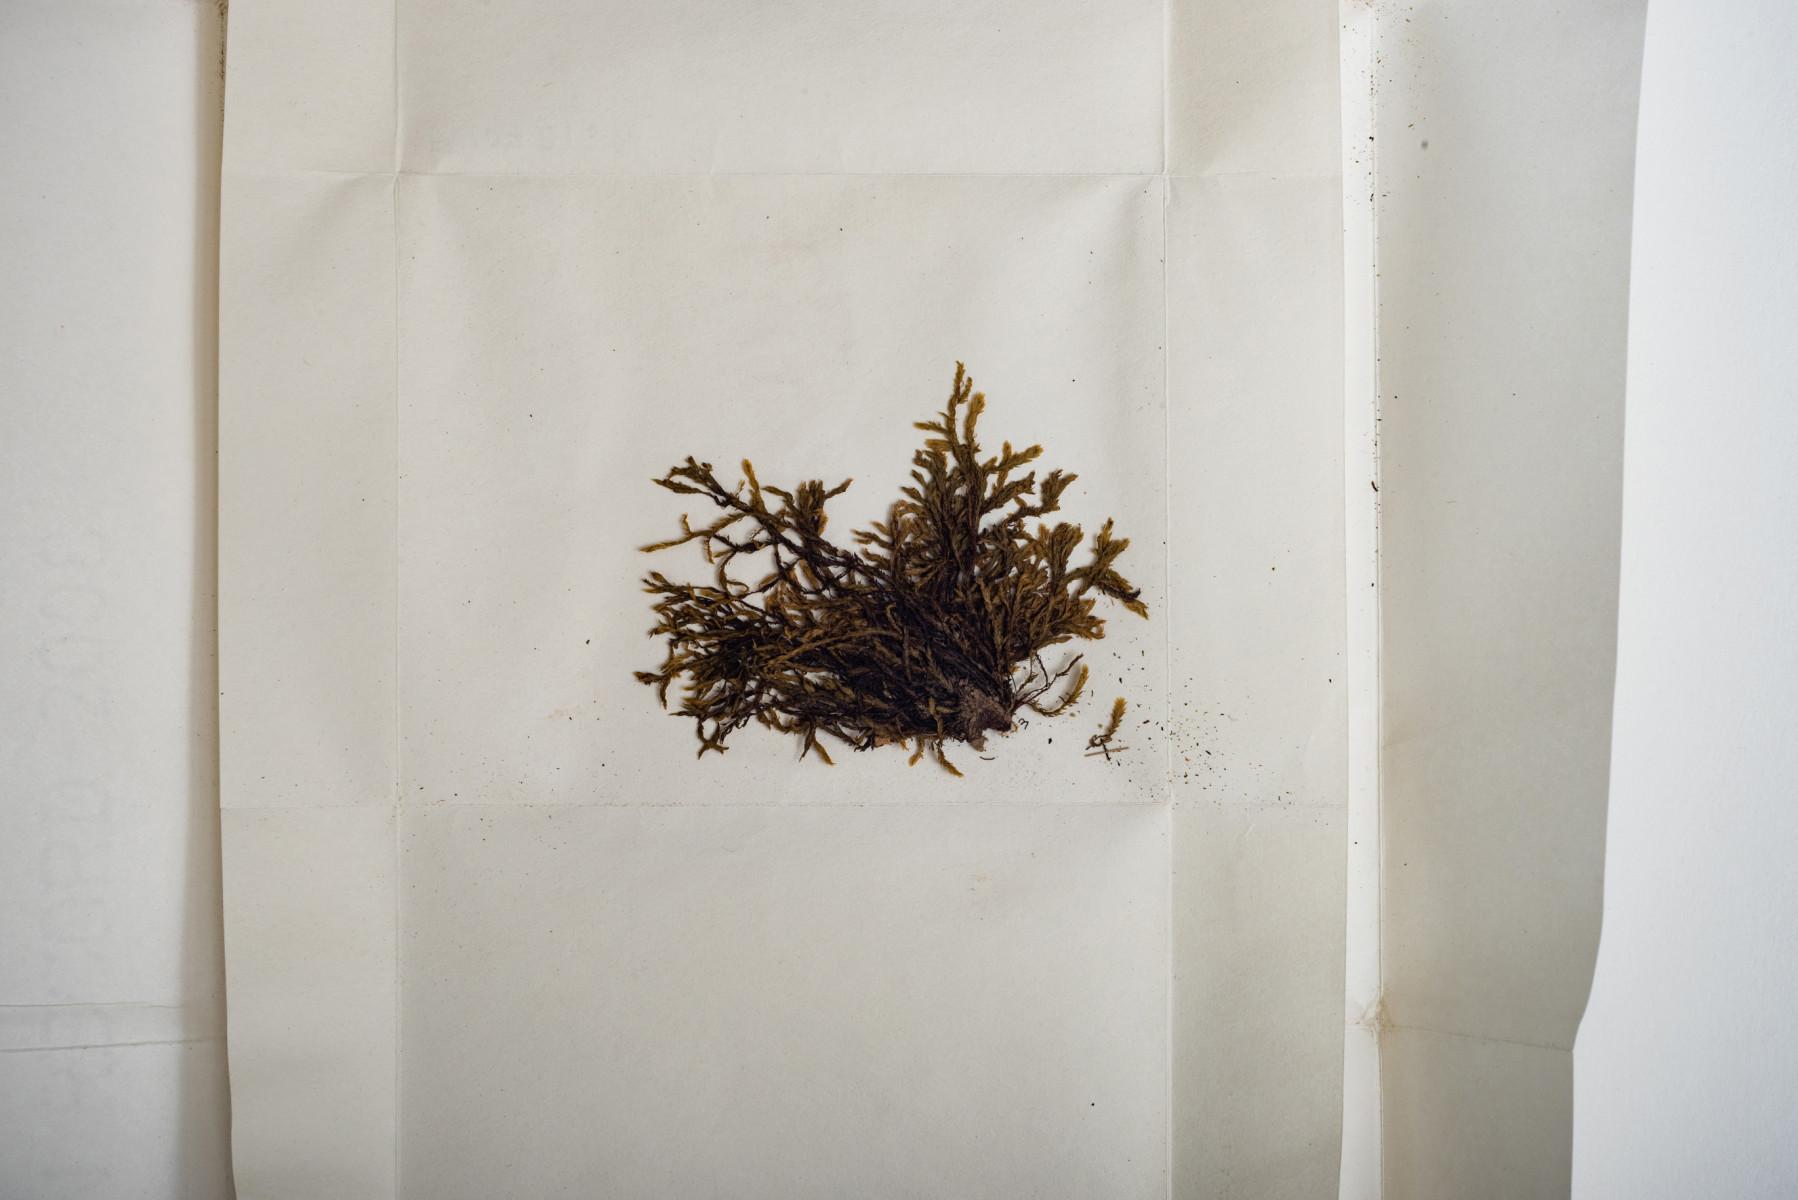 Fissidens hydropogon moss botany Fissidens hydropogon - Extinction